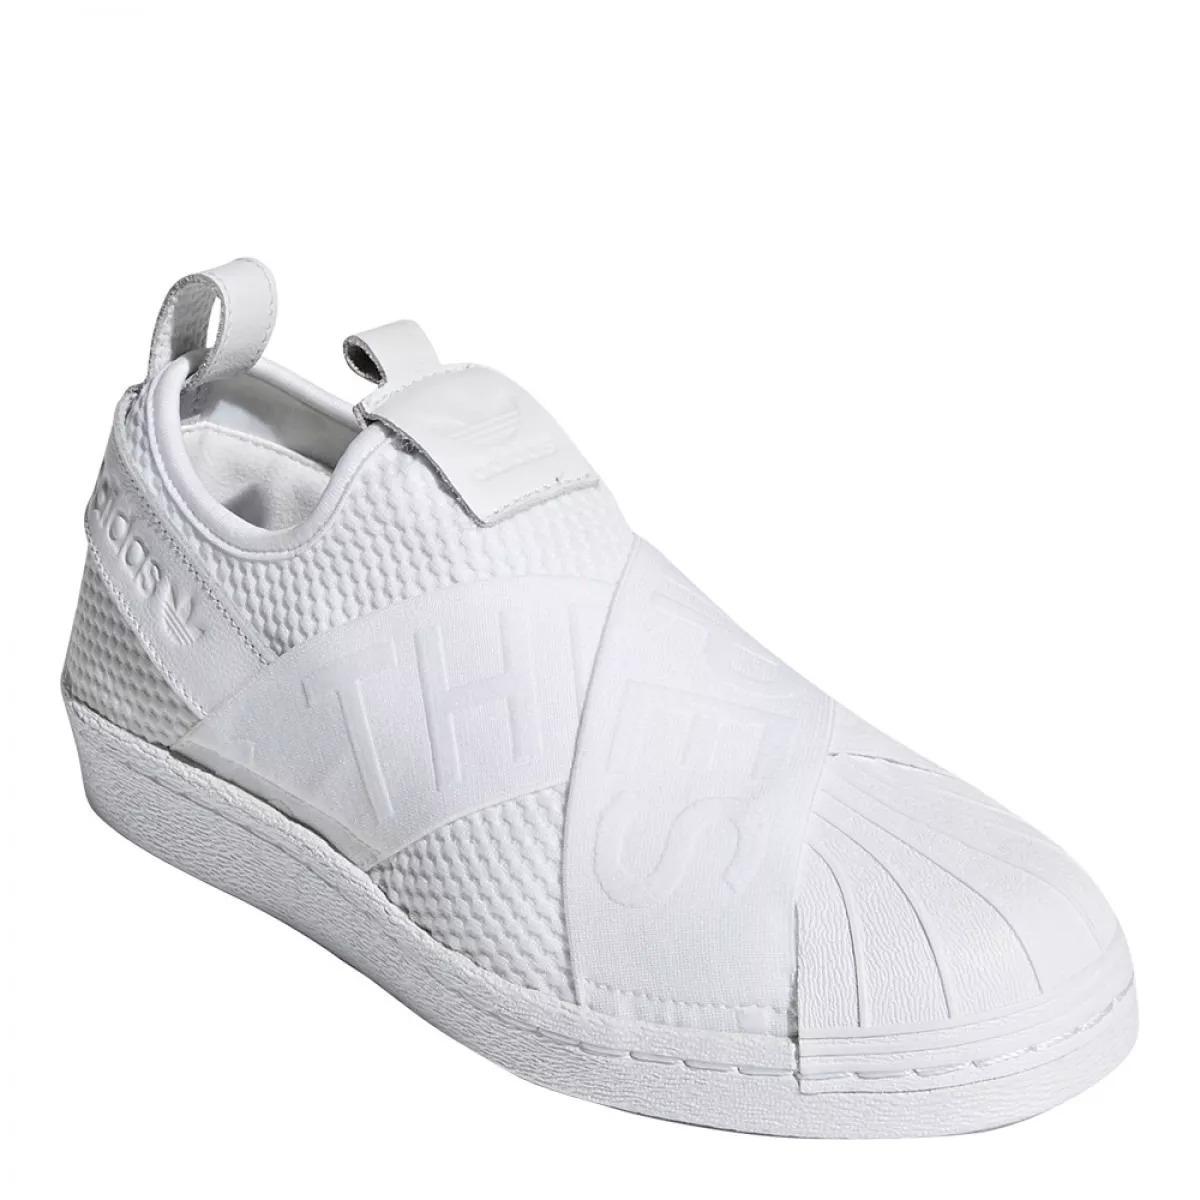 946df8f8 Zapatillas adidas Originals Superstar Slip On Blancas - $ 2.850,00 ...